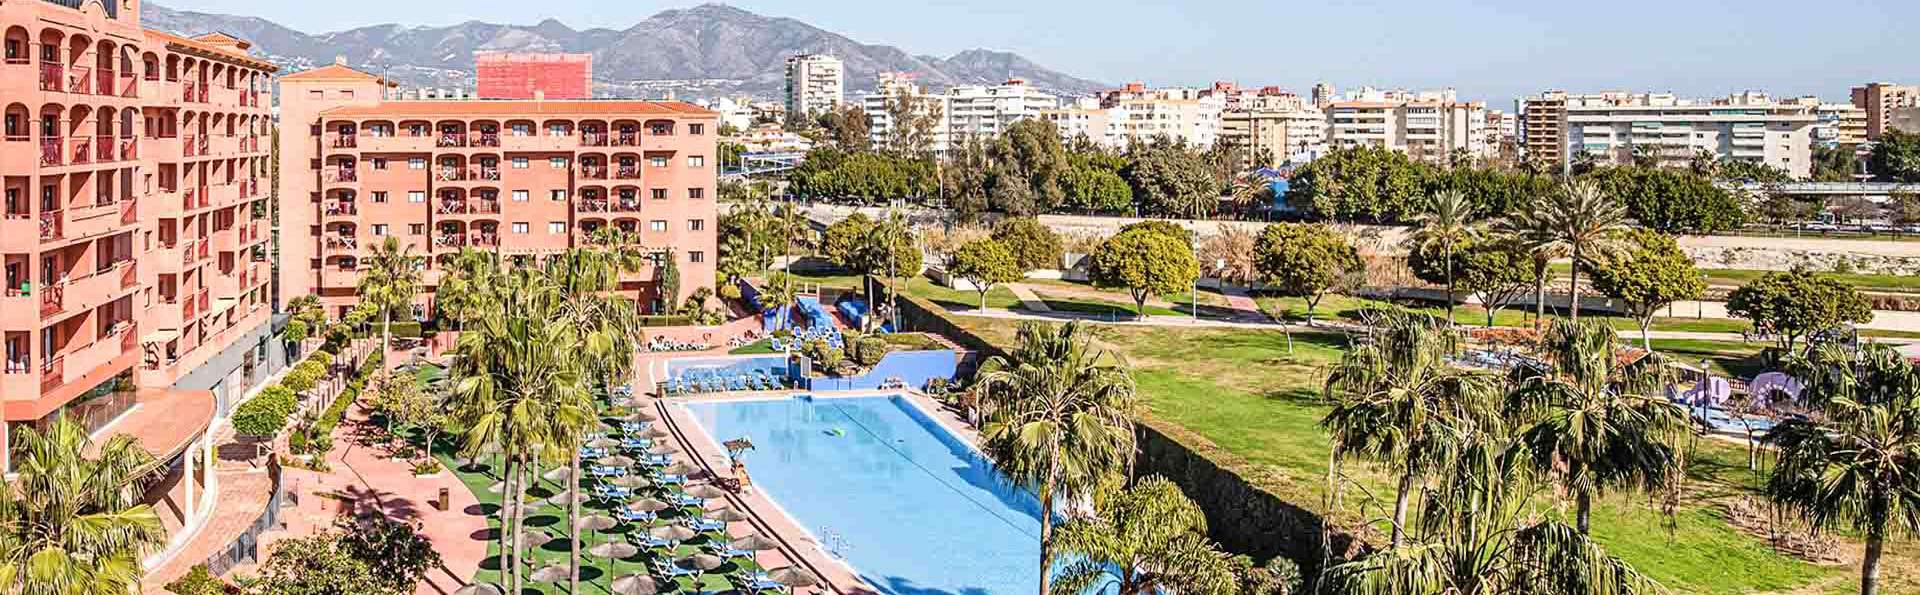 Aparthotel Myramar Fuengirola - EDIT_Hotel_Myramar_Fuengirola_04.jpg